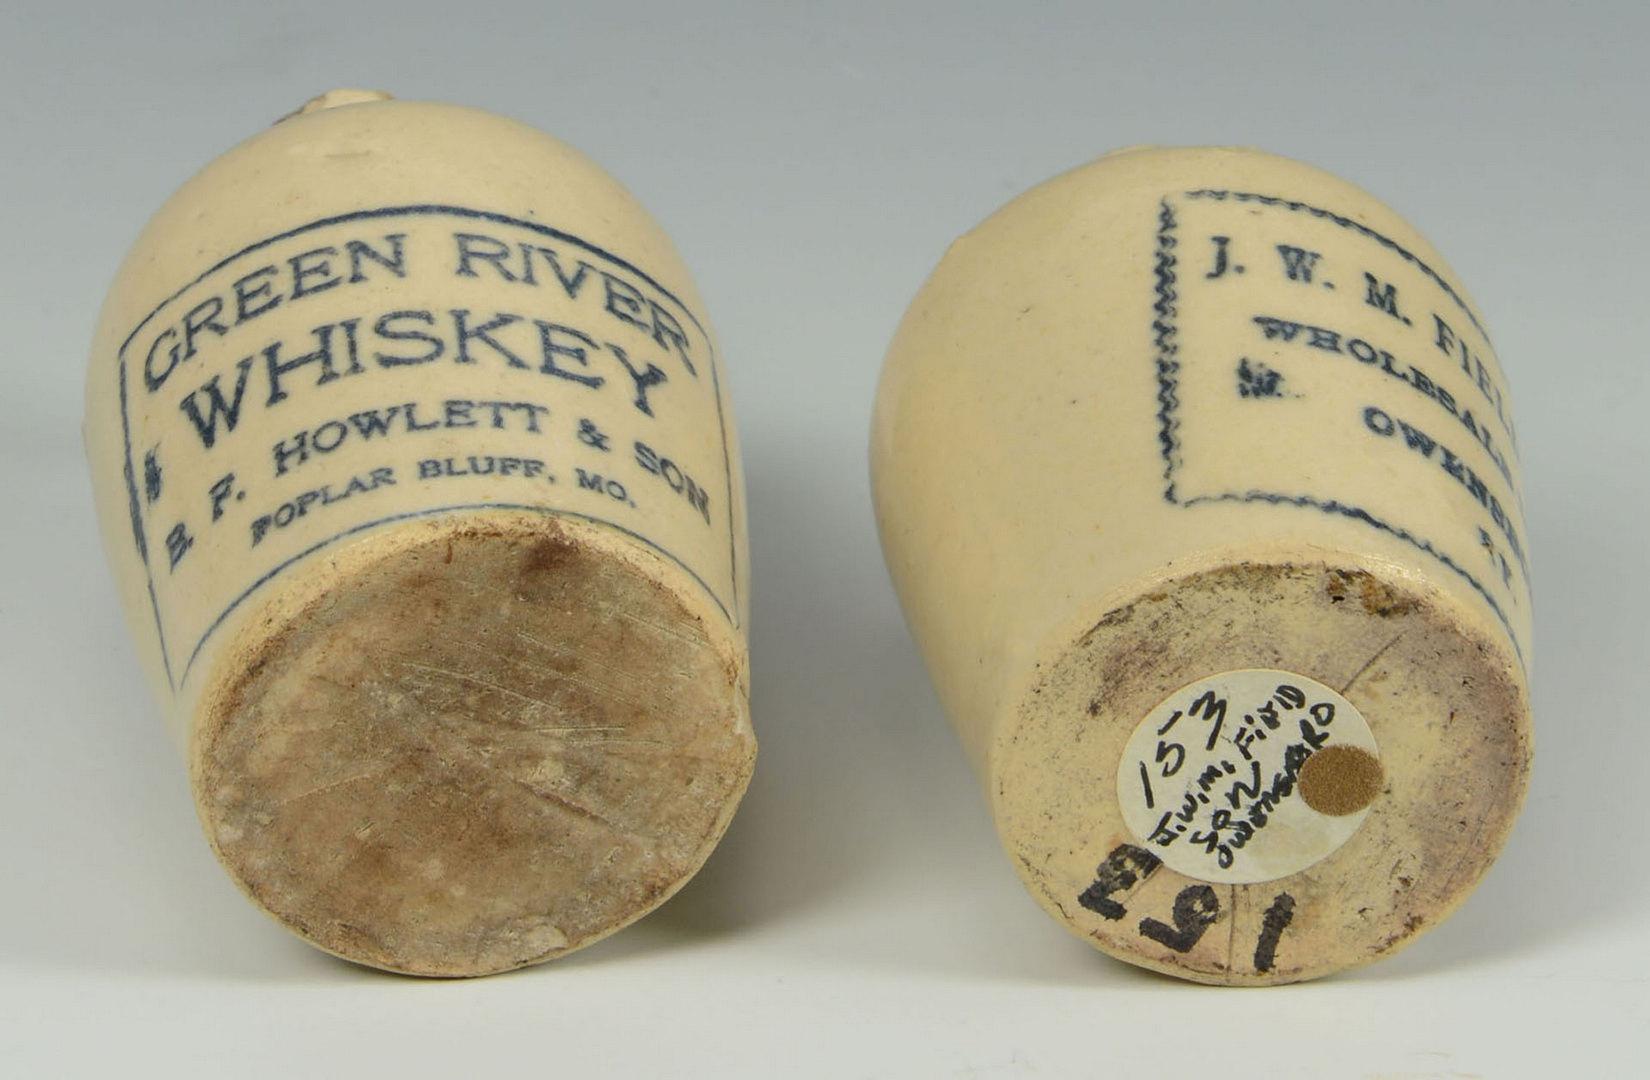 Lot 549: 2 Miniature Kentucky Whiskey Jugs, Owensboro